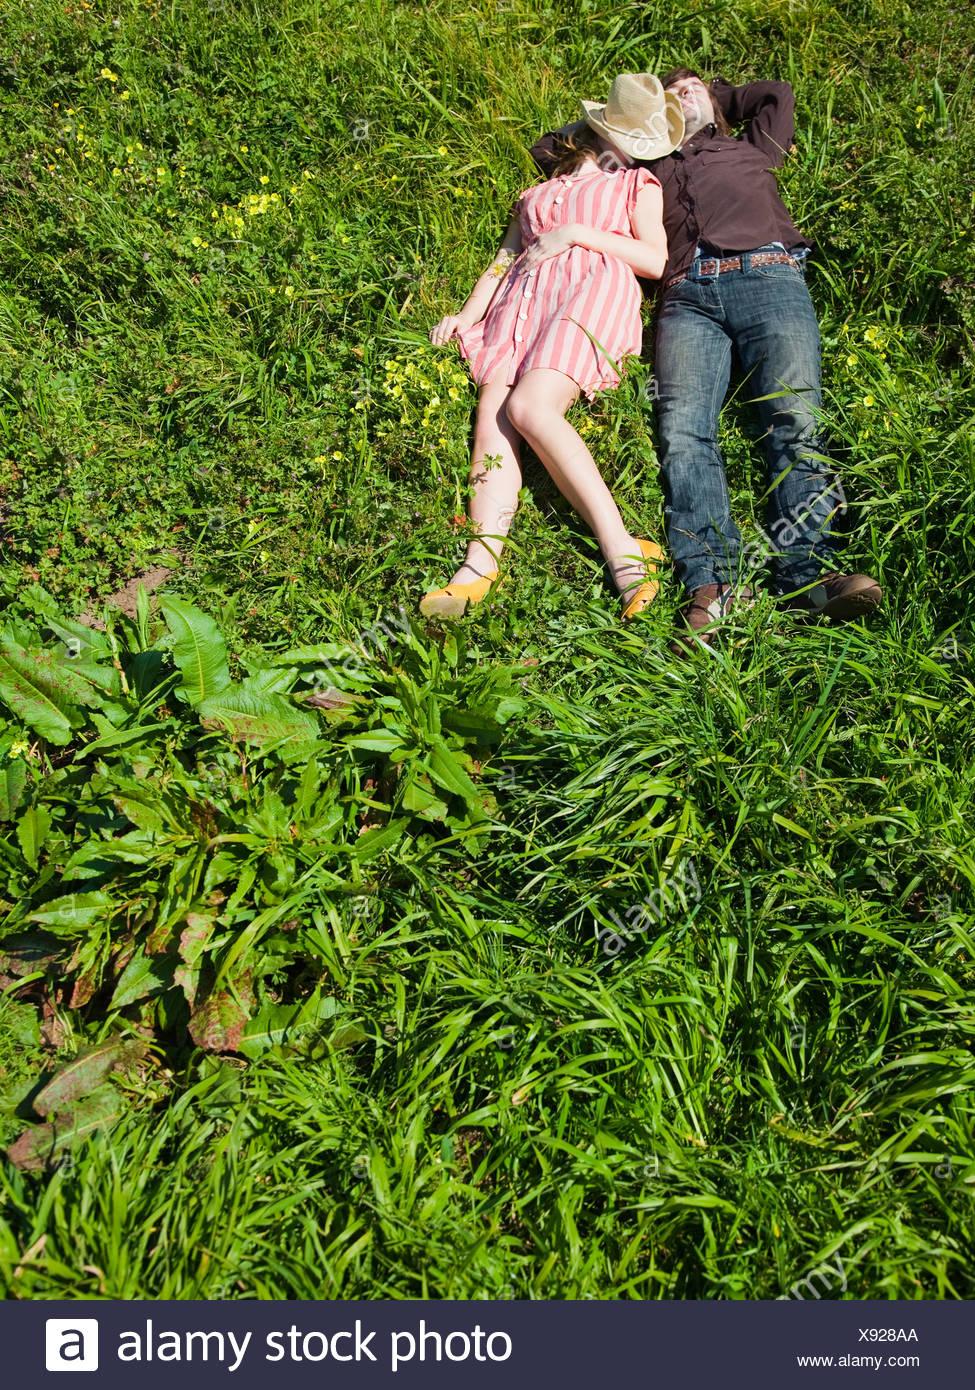 USA, California, San Francisco, young couple lying on back on grass - Stock Image